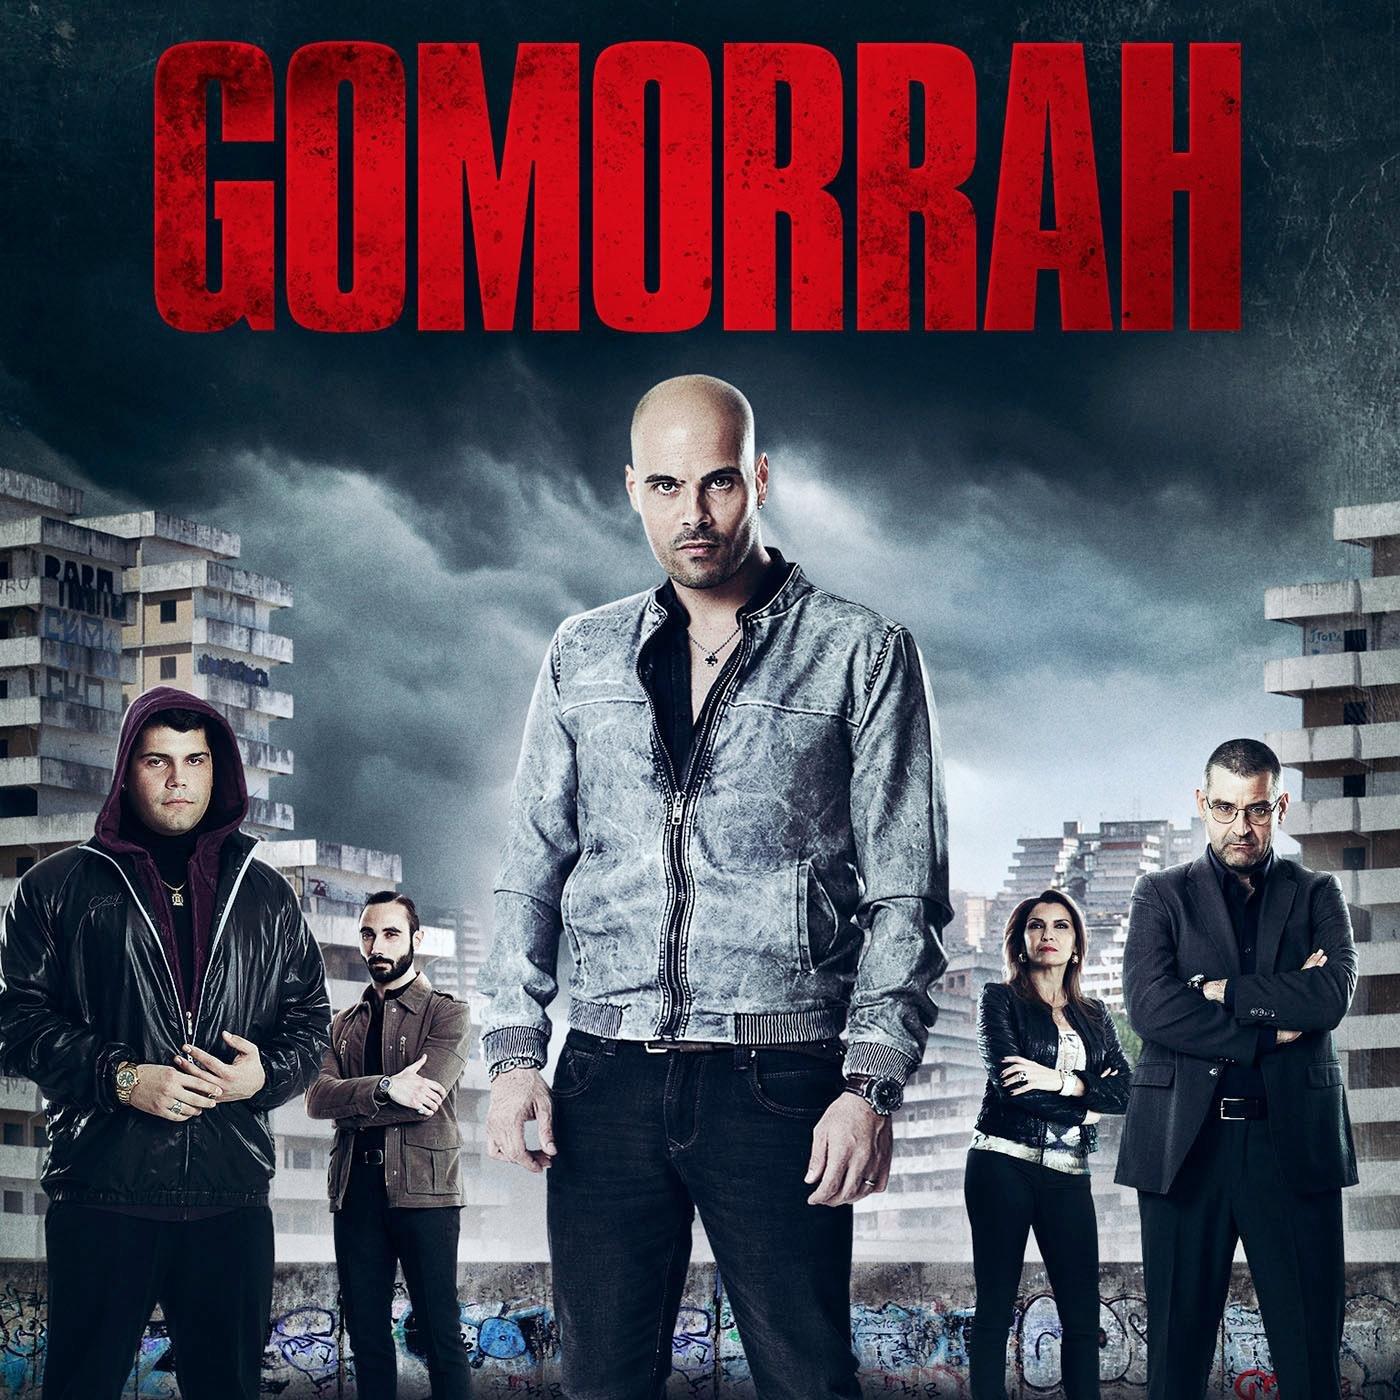 Gomorrah TV series Sky Atlantic